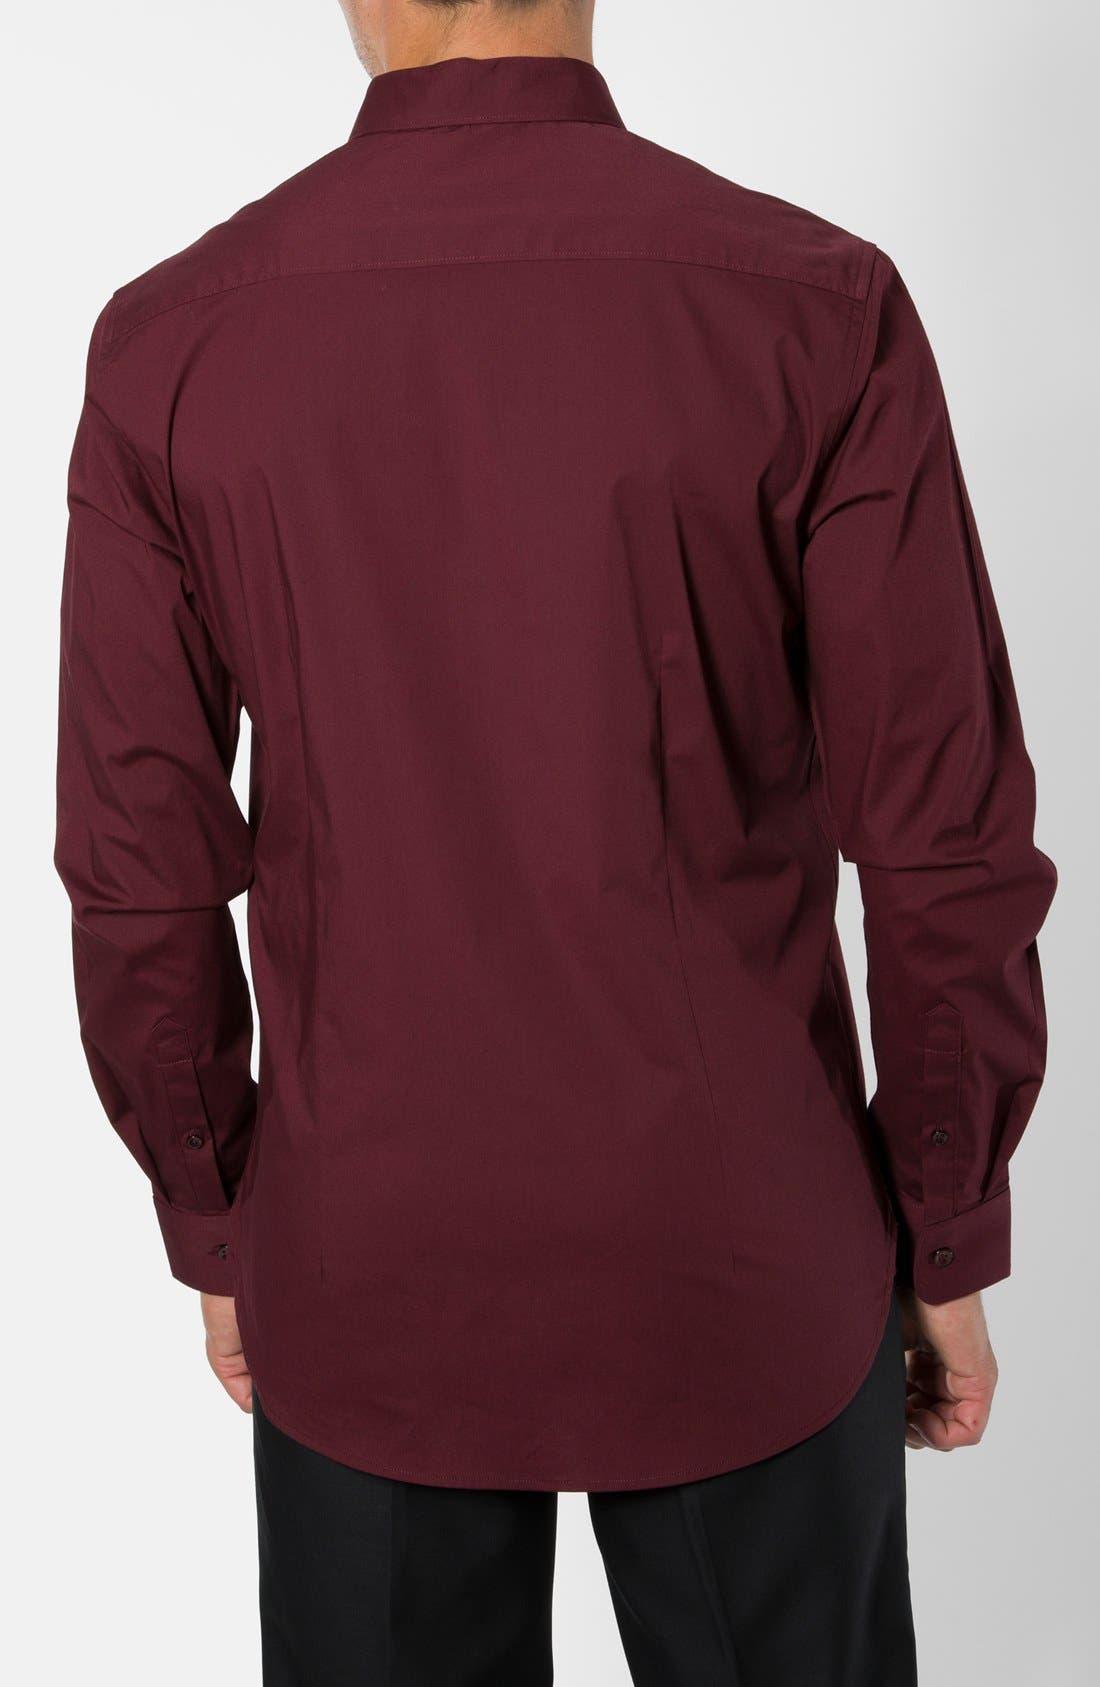 'Peace Train' Trim Fit Woven Shirt,                             Alternate thumbnail 2, color,                             Maroon